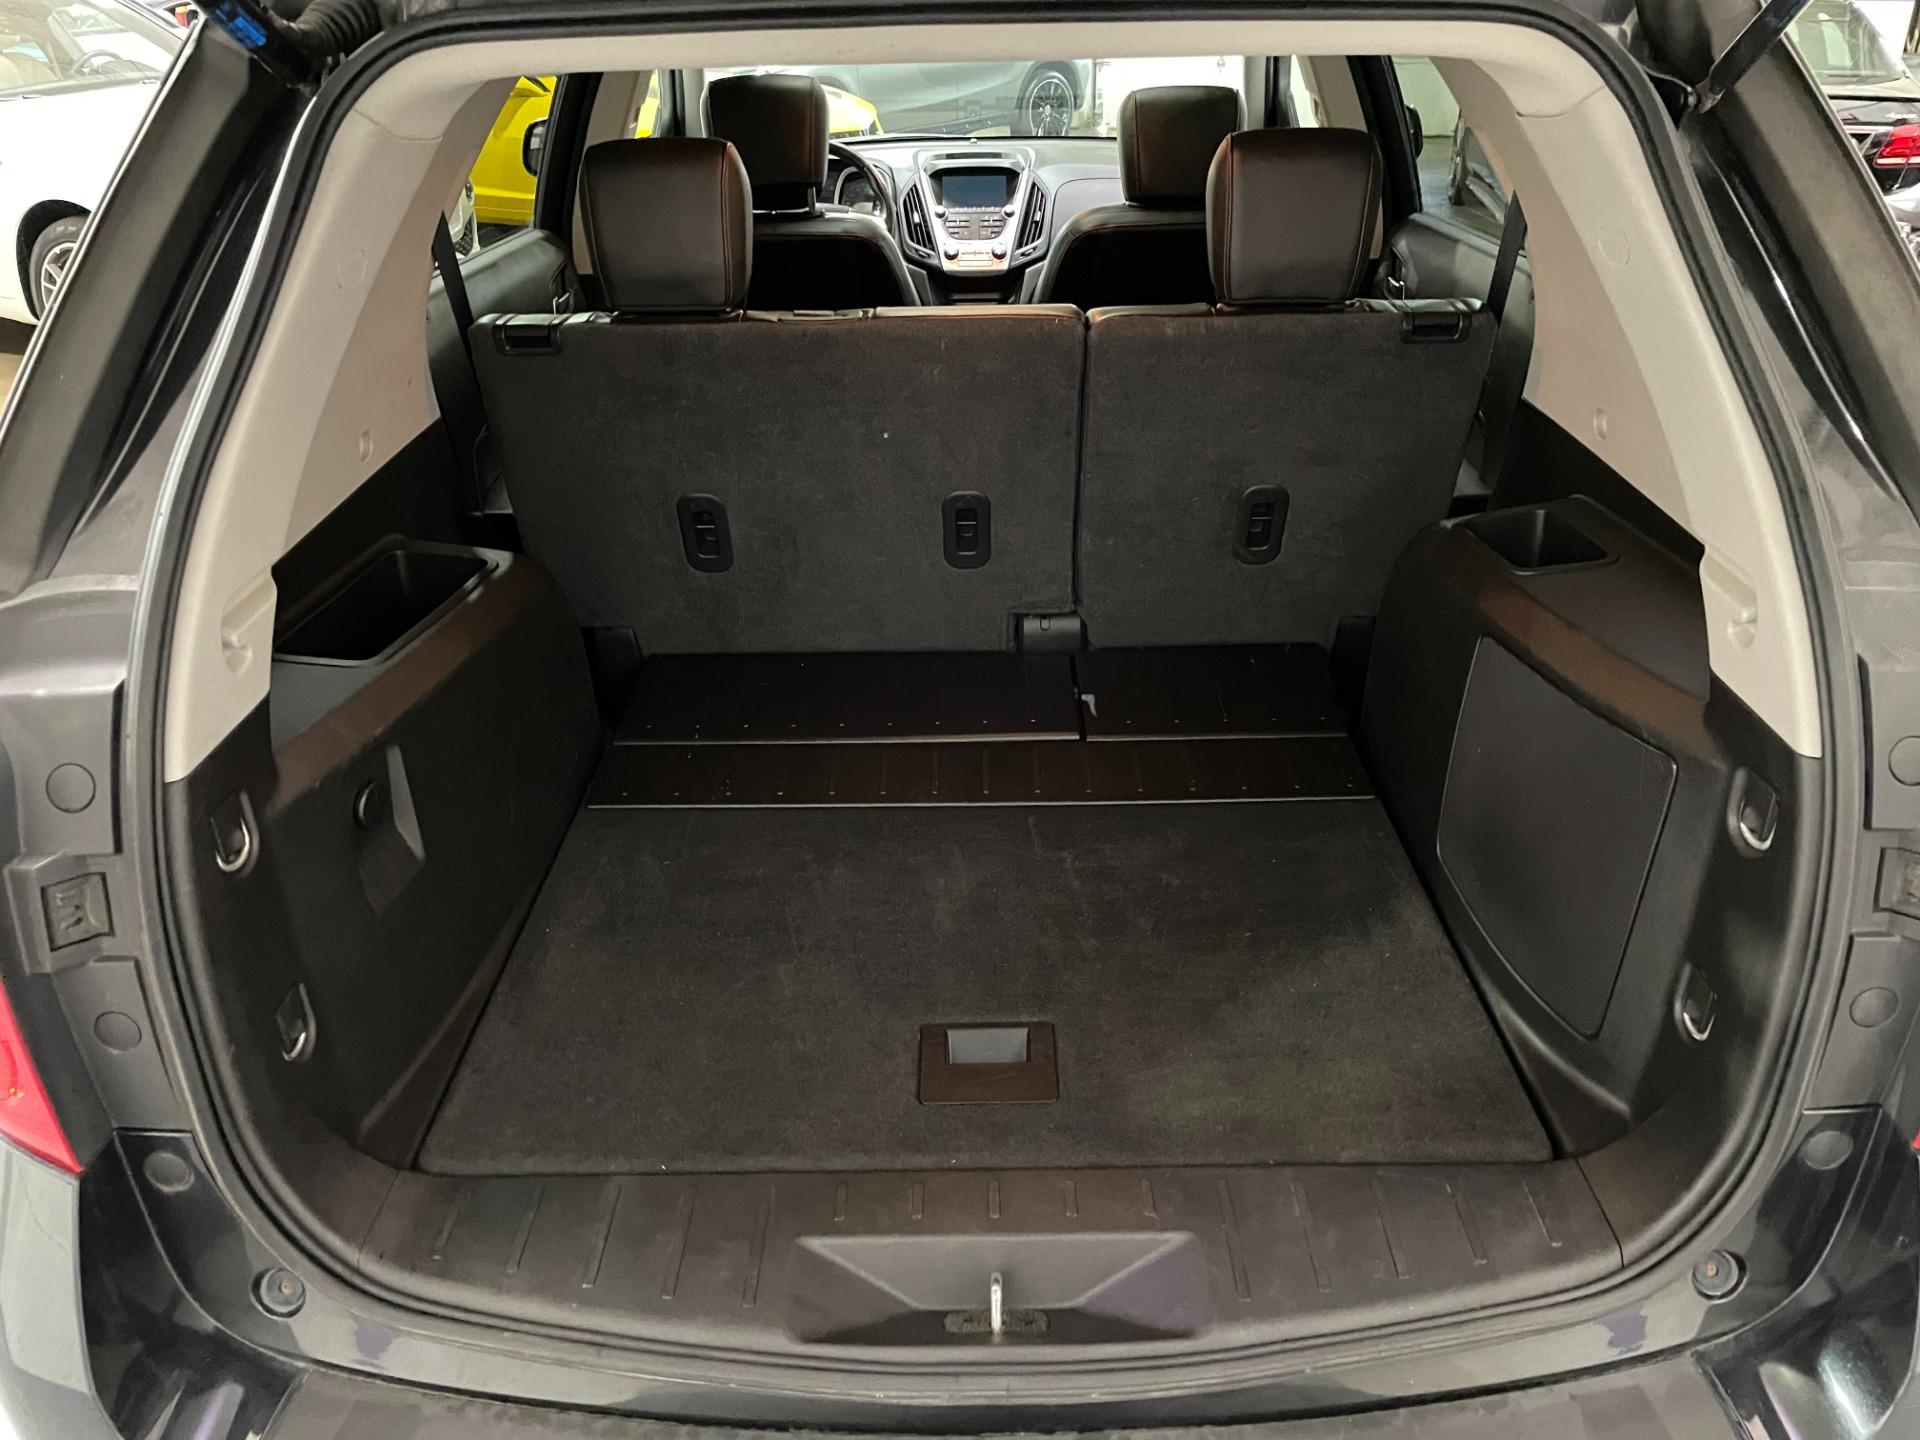 Used-2013-Chevrolet-Equinox-LTZ-FWD